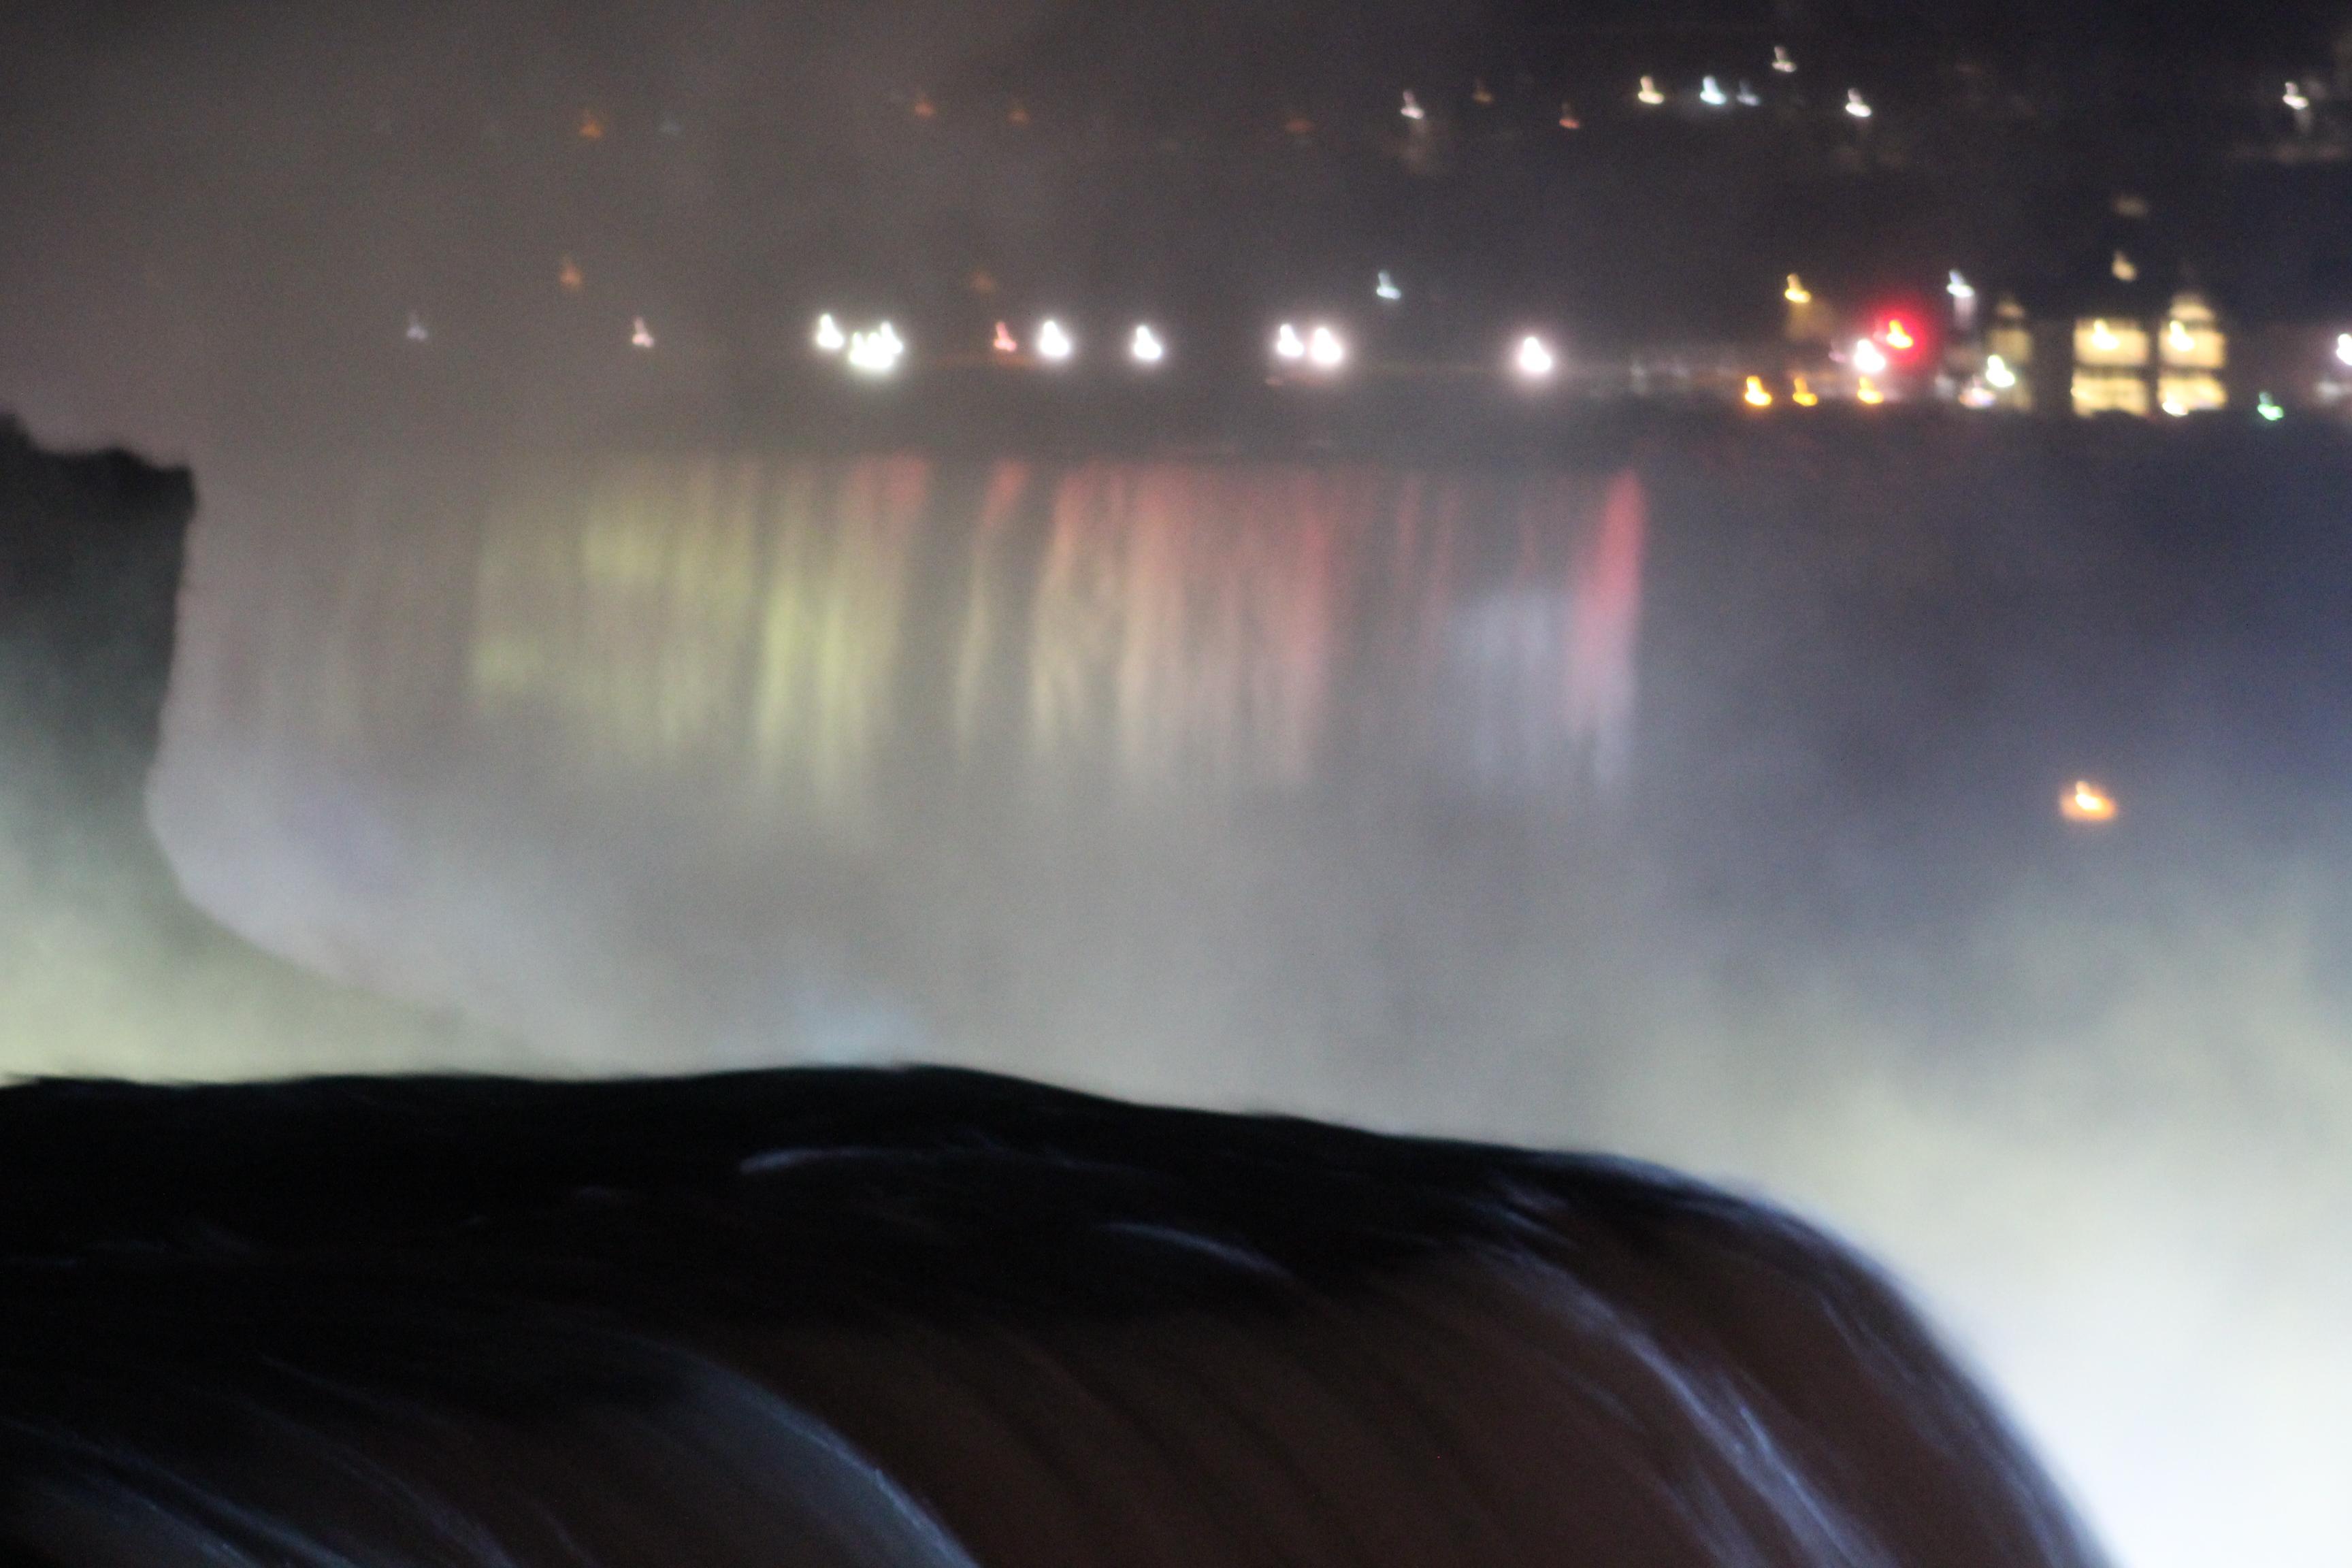 Illuminatig lights at Niagara Falls